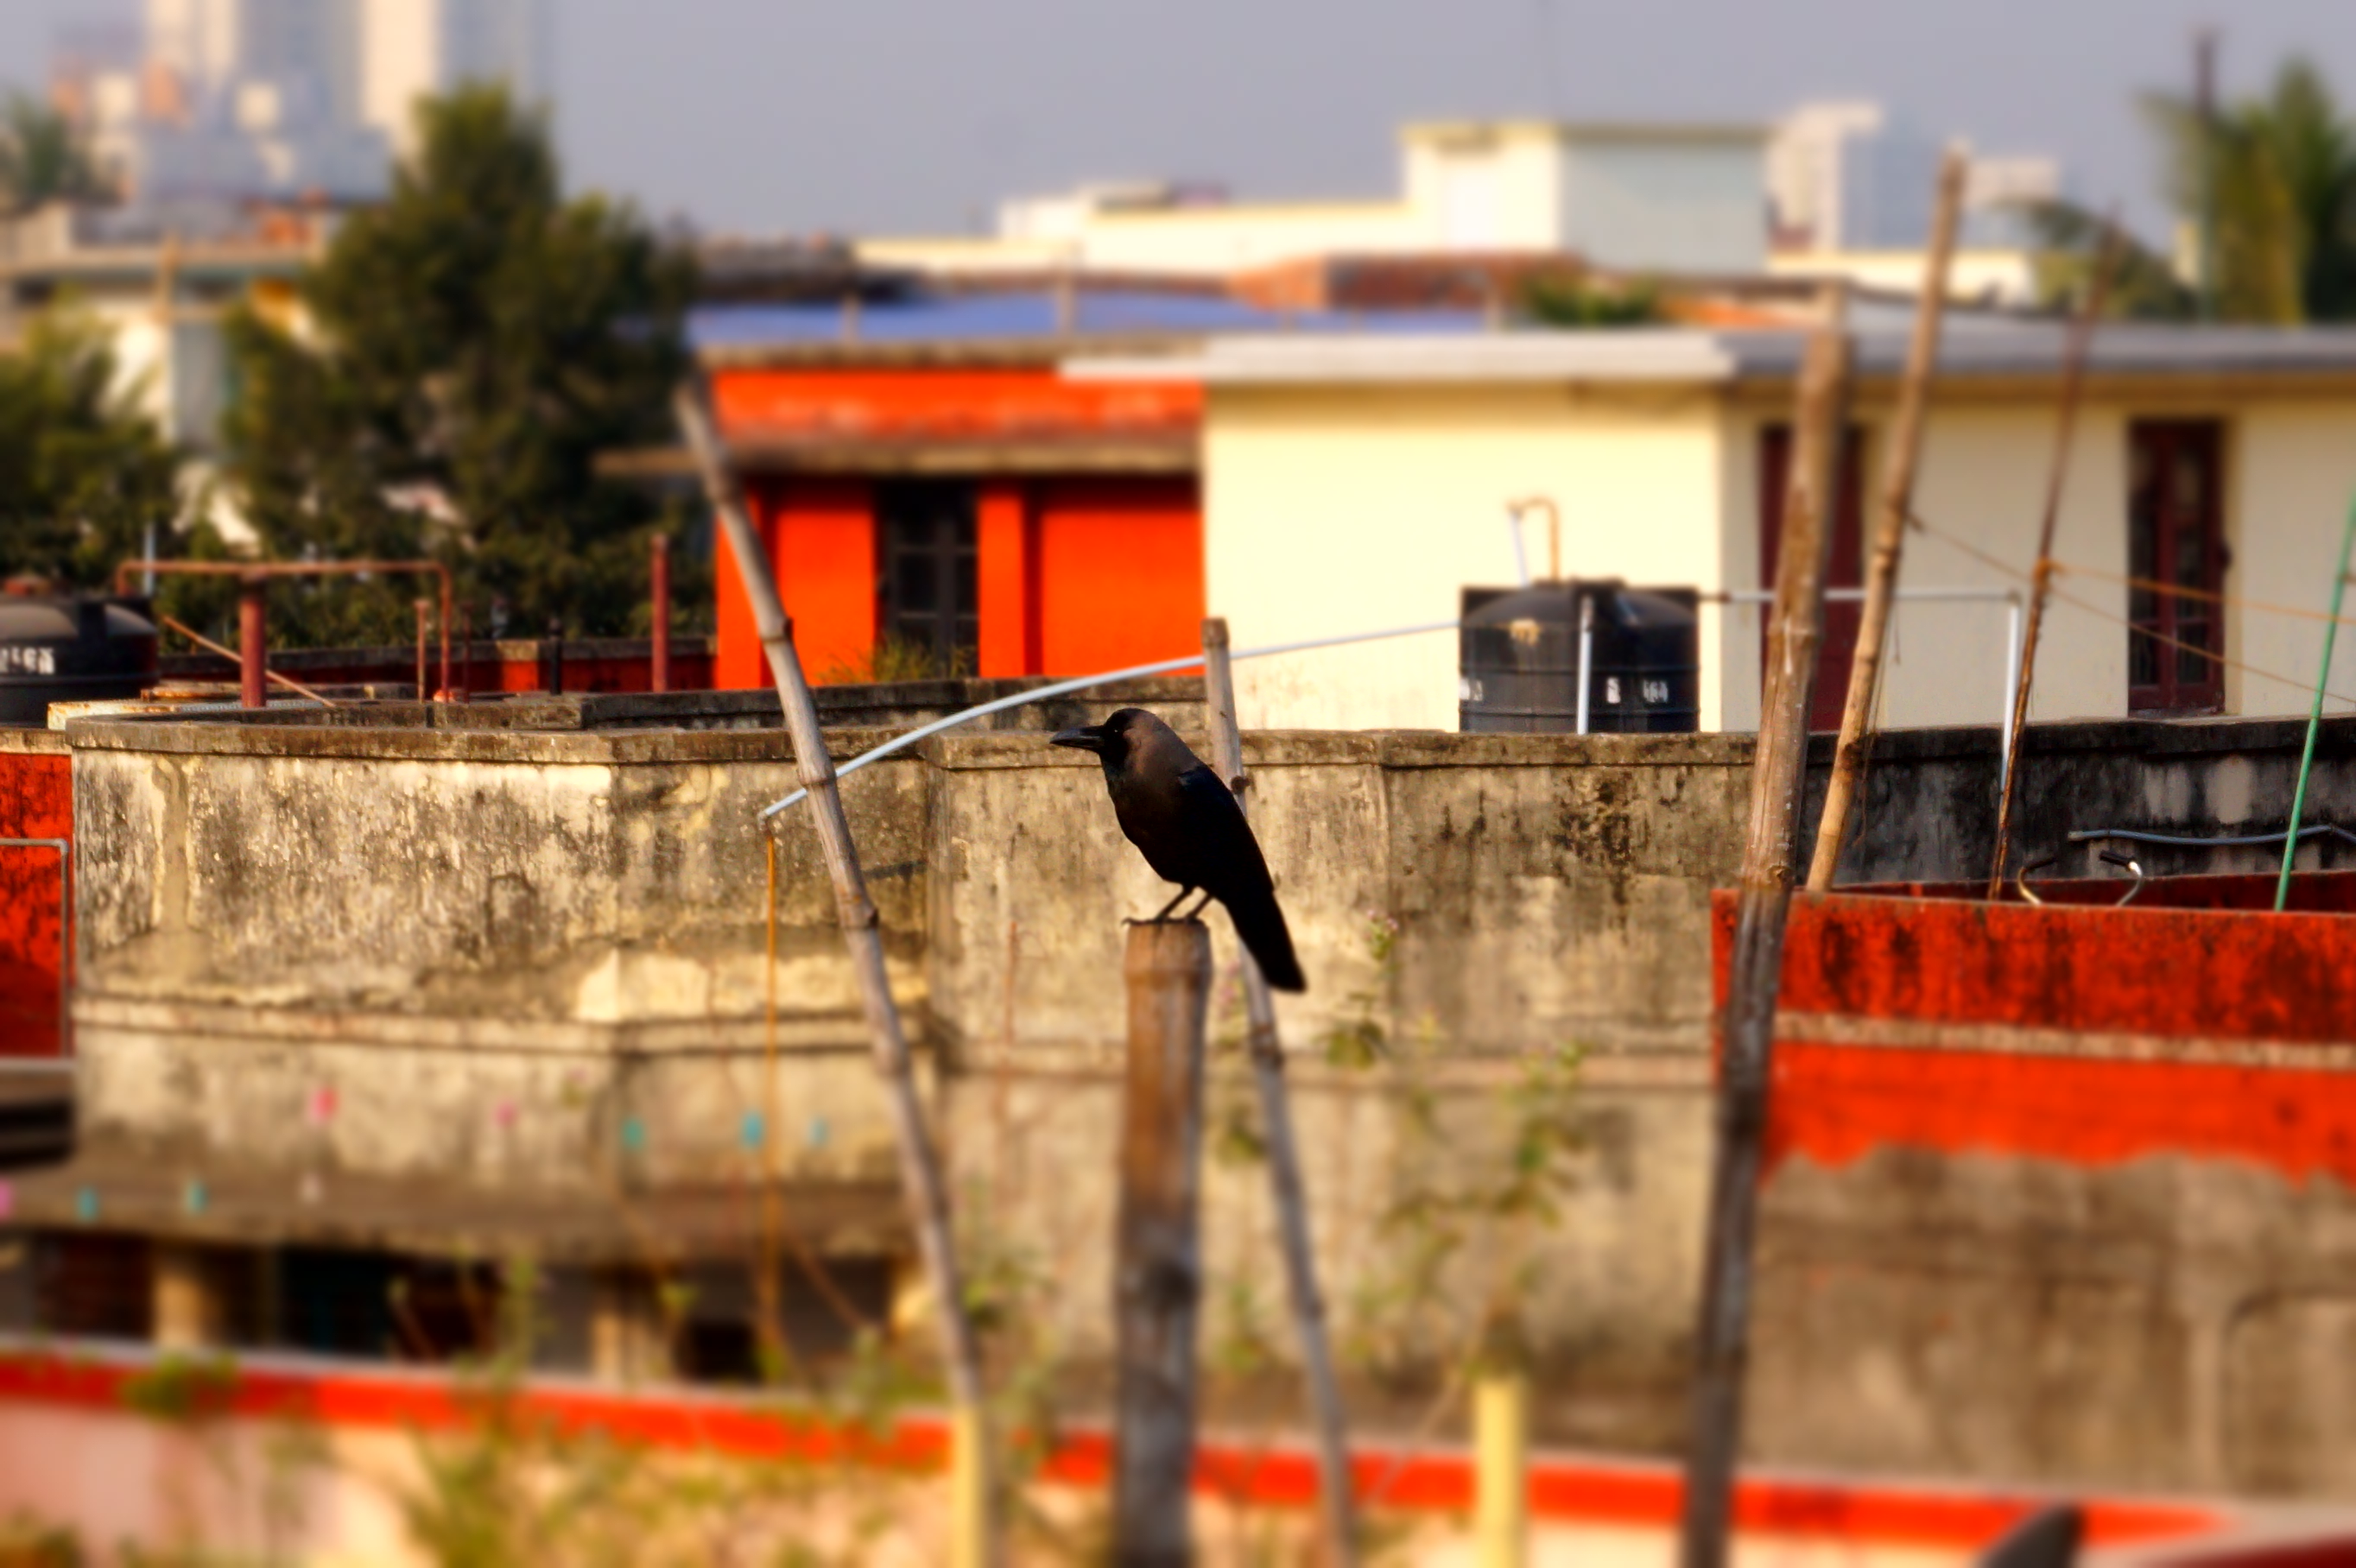 The crowings of Monsieur Crow – World beneath the feet